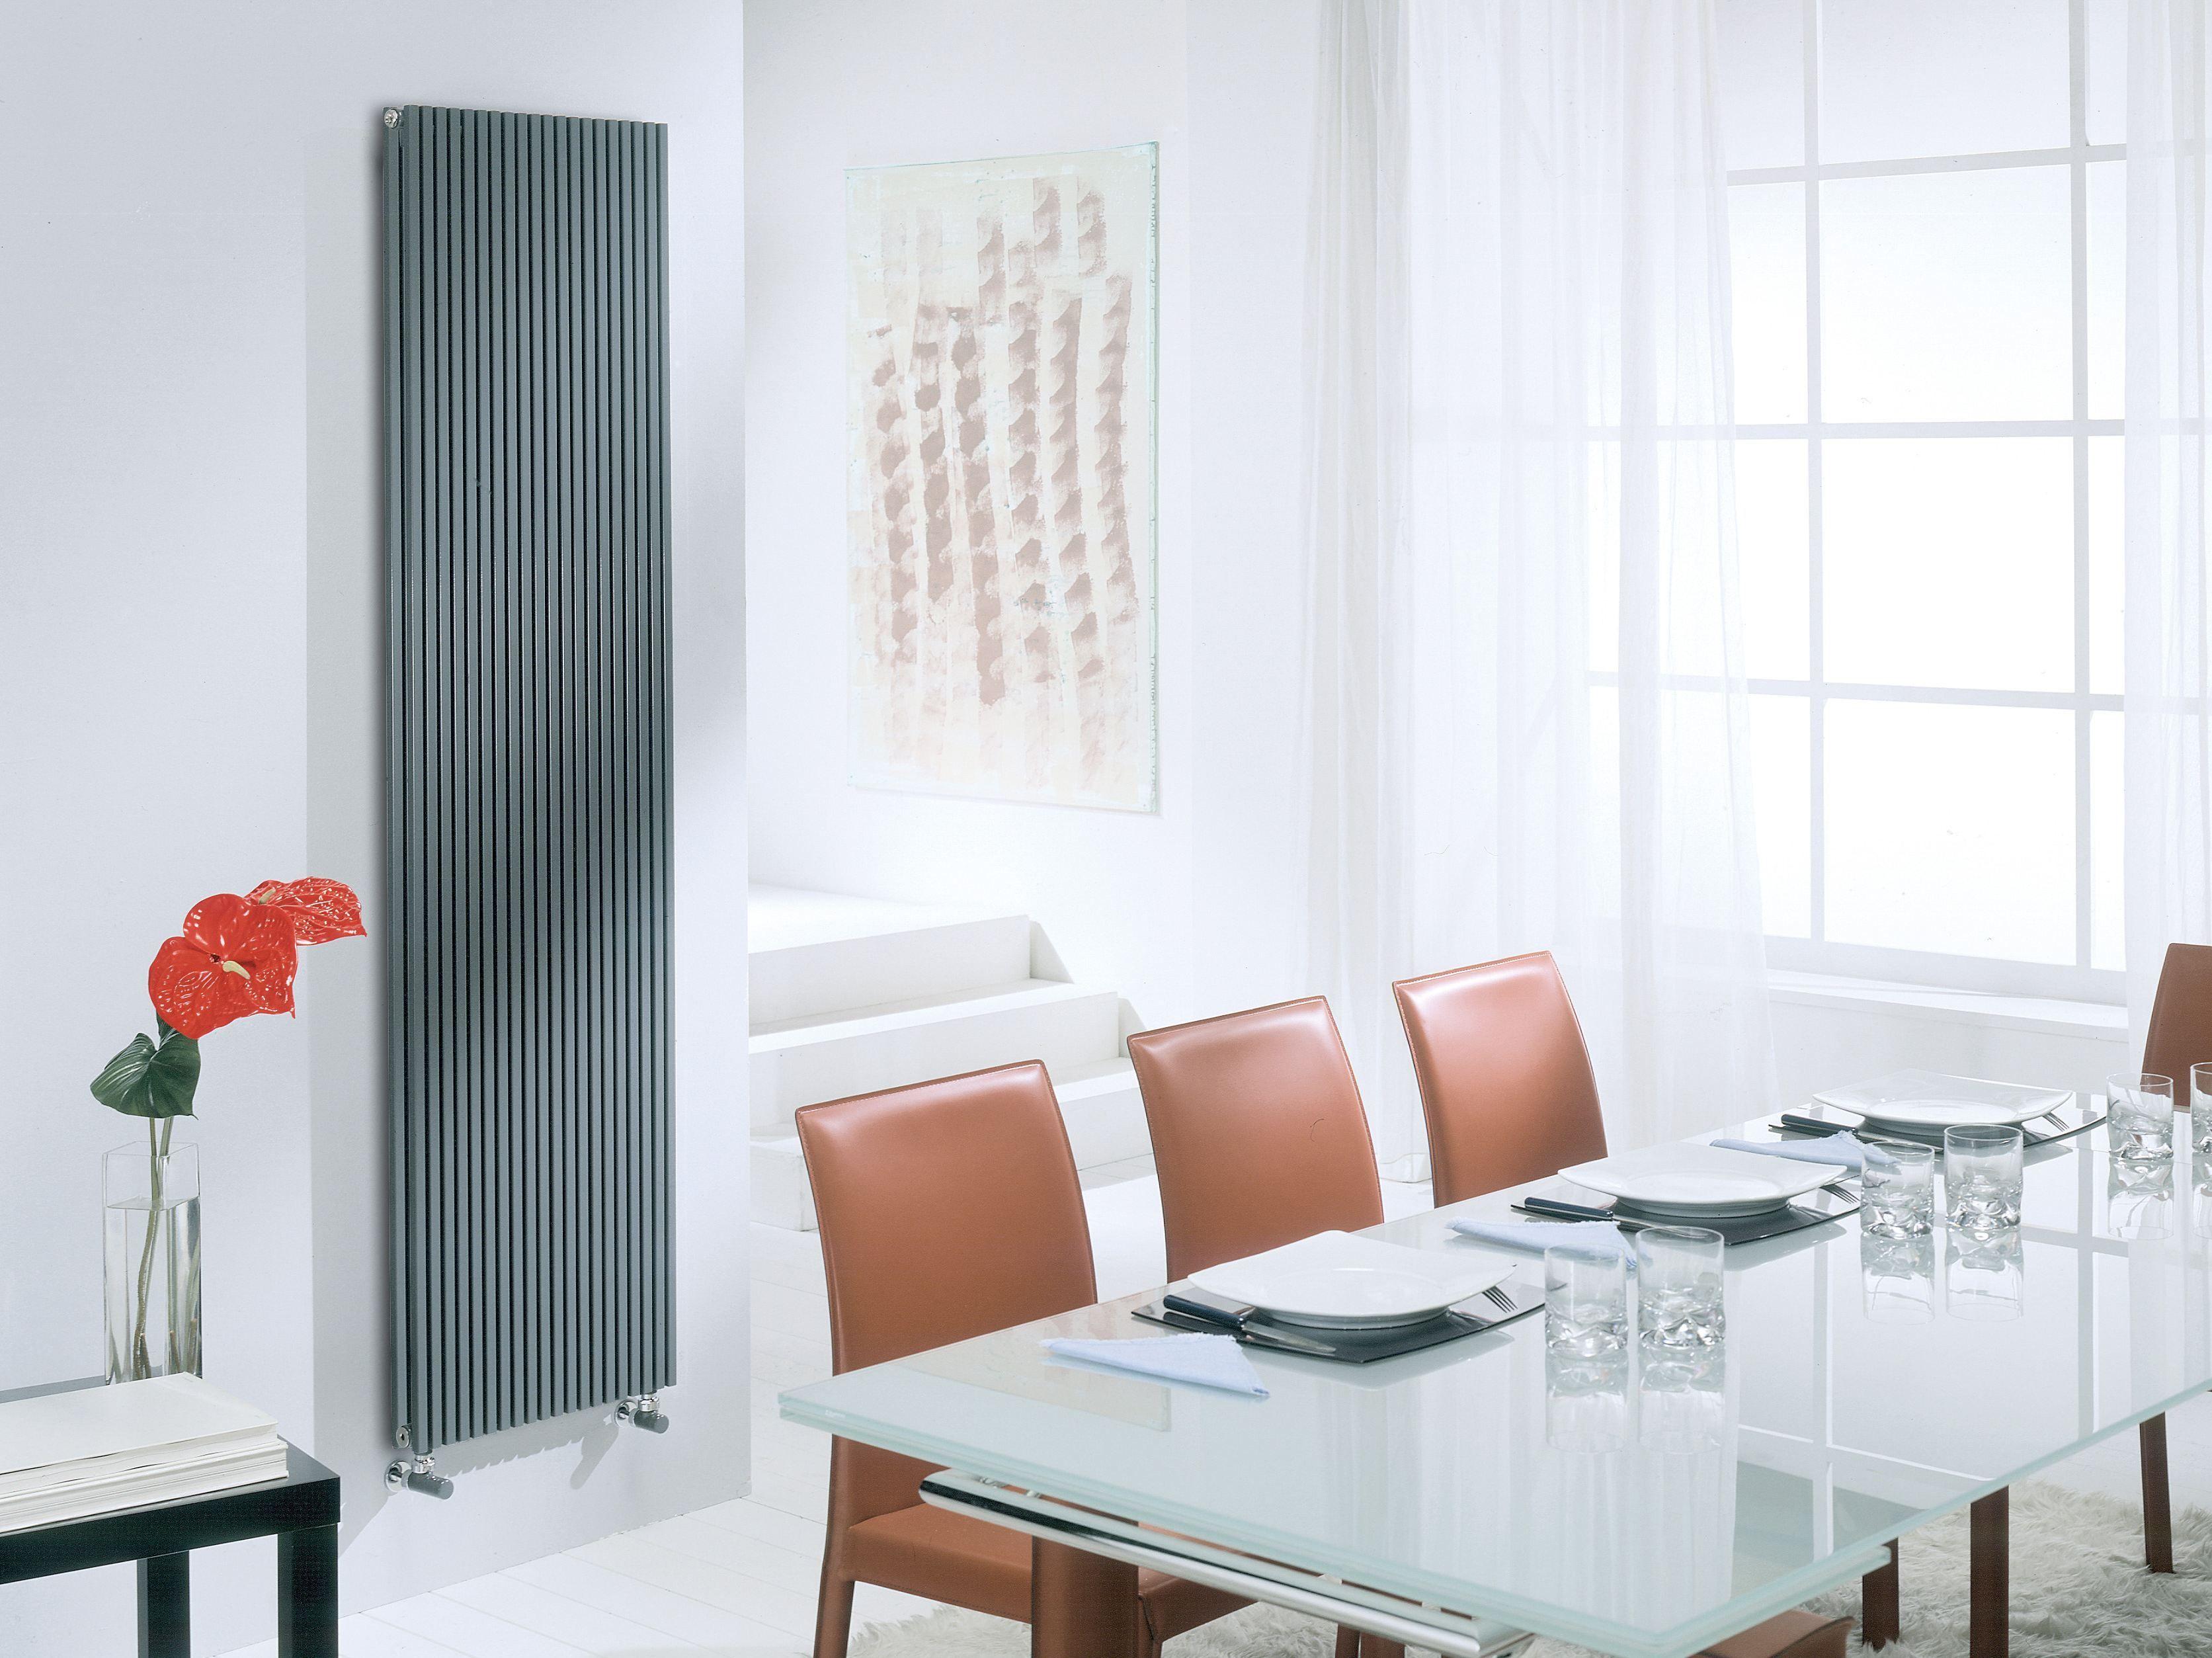 Radiatore verticale a parete ad acqua calda karin vx for Parete acqua